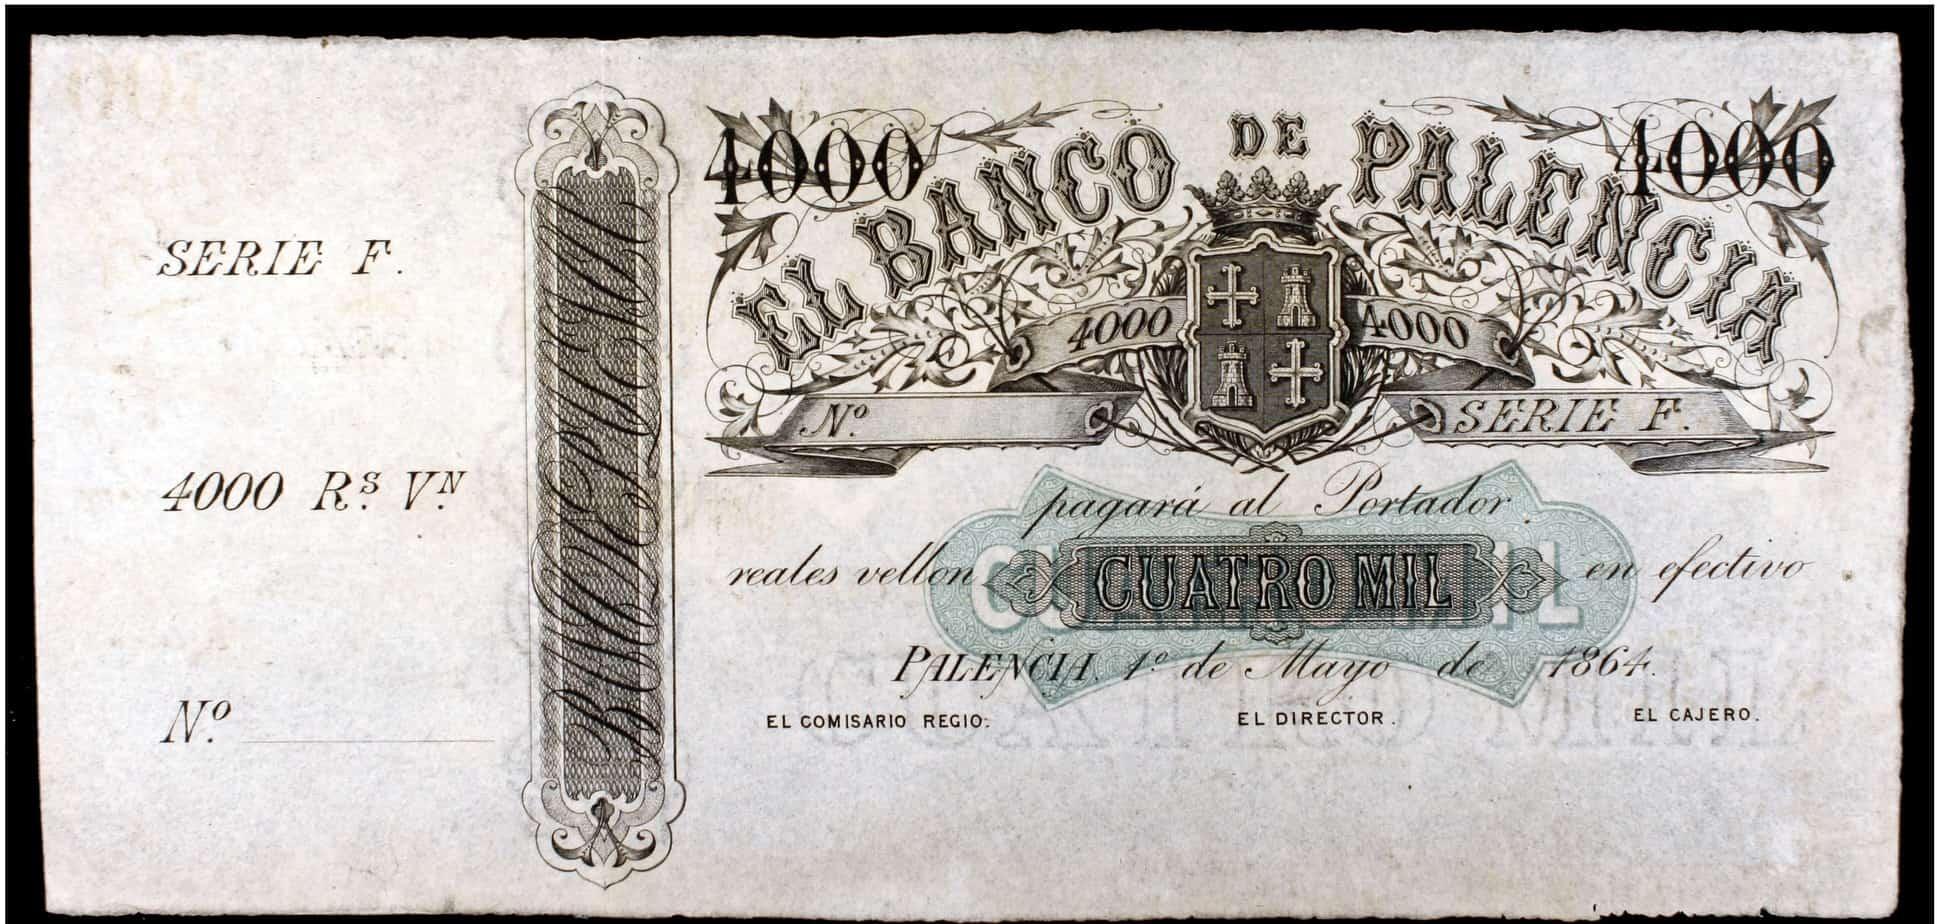 4000 reales de vellón, Banco de Palencia